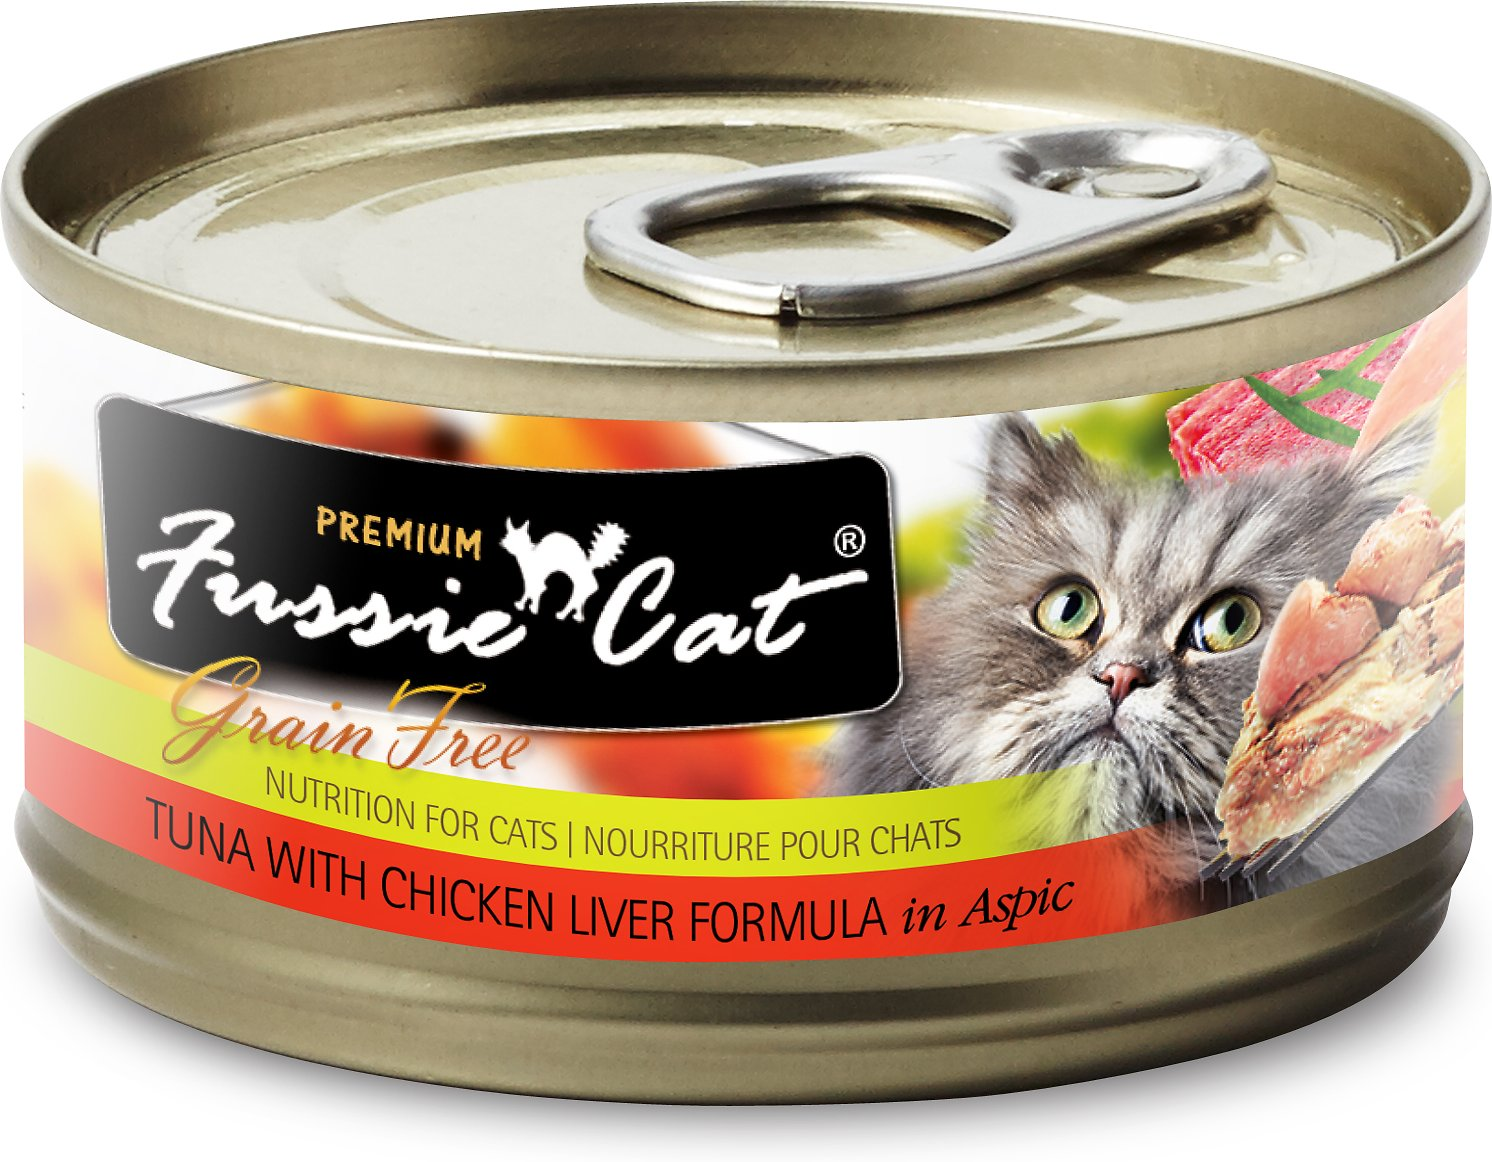 Fussie Cat Premium Tuna with Chicken Liver Formula in Aspic Grain-Free Canned Cat Food, 2.8-oz